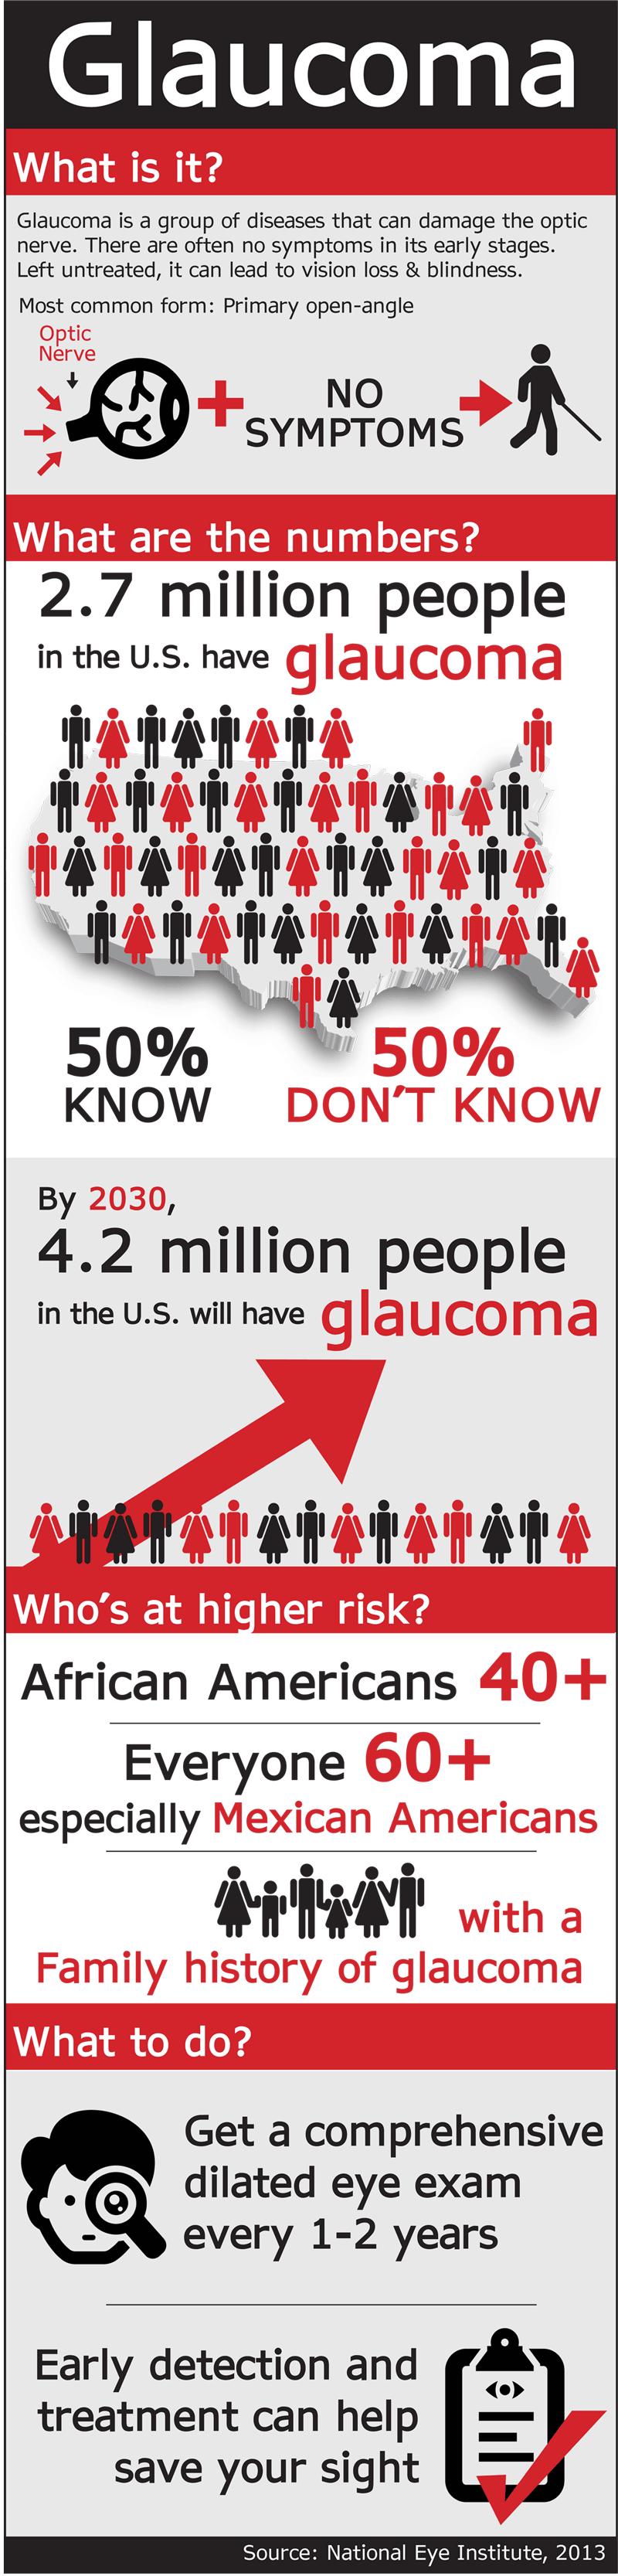 Glaucoma Infographic